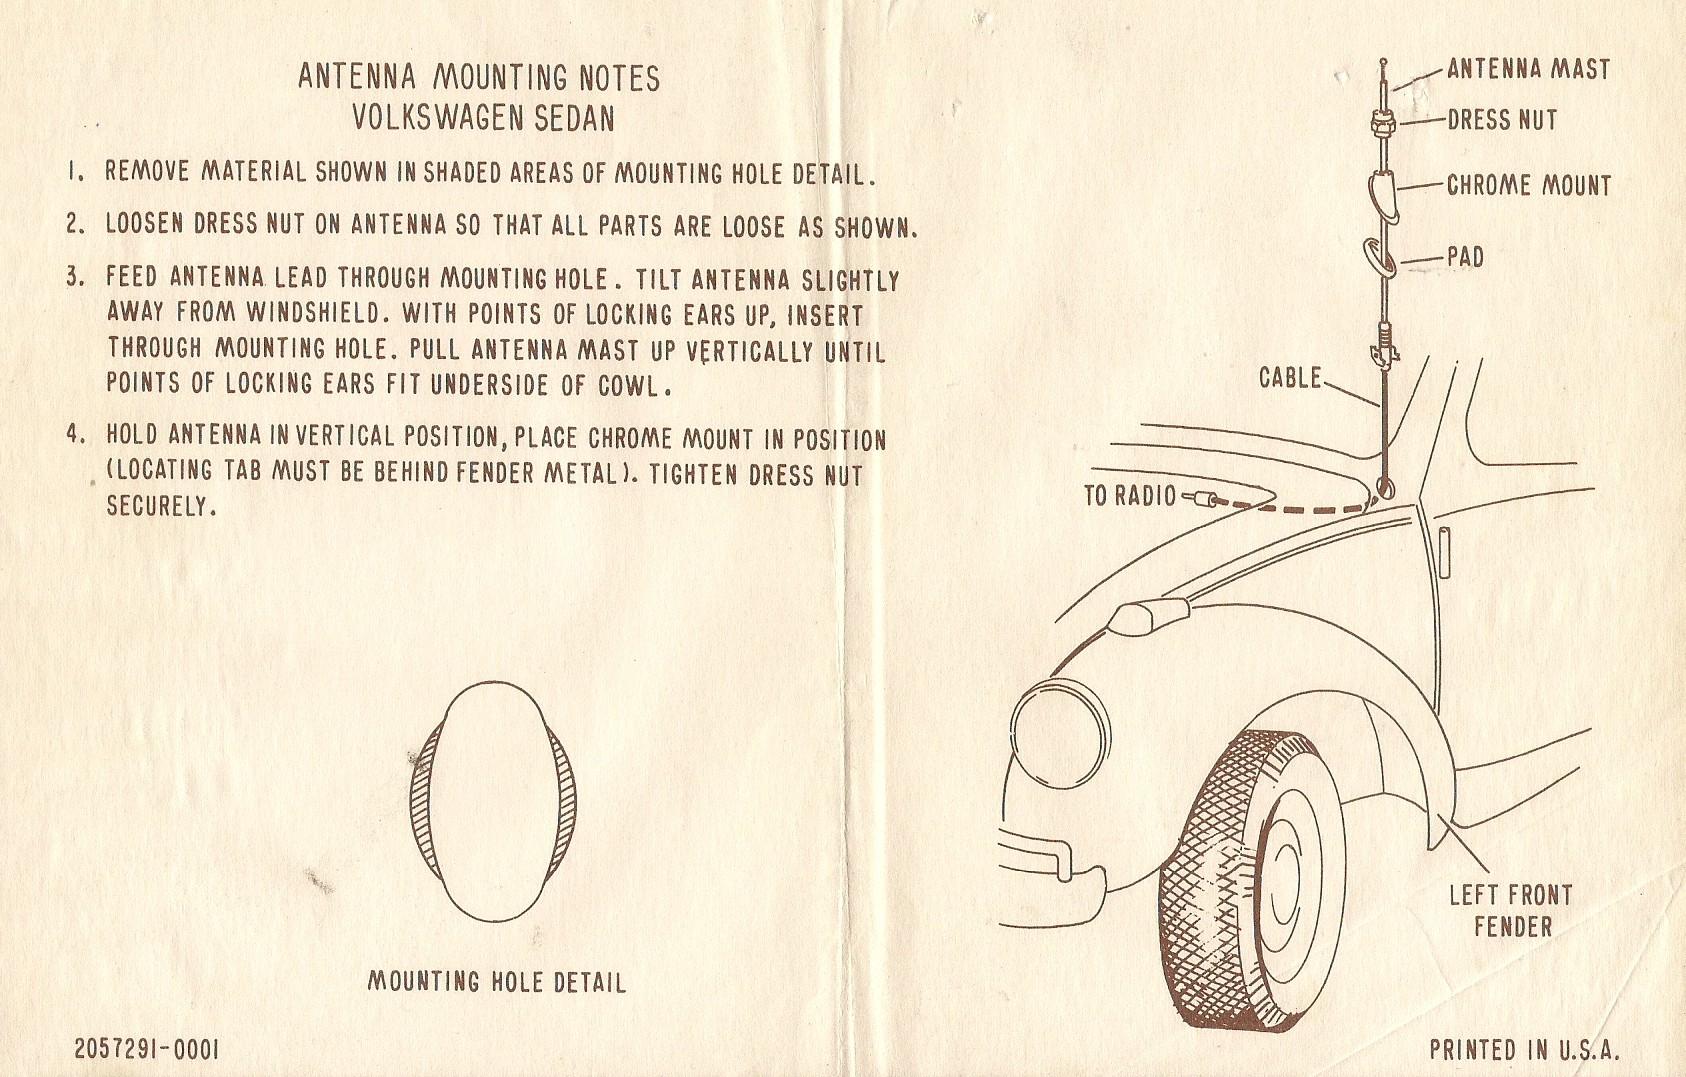 67 Volkswagen Beetle Am Sapphire V Radio 1967 Vw Beetle